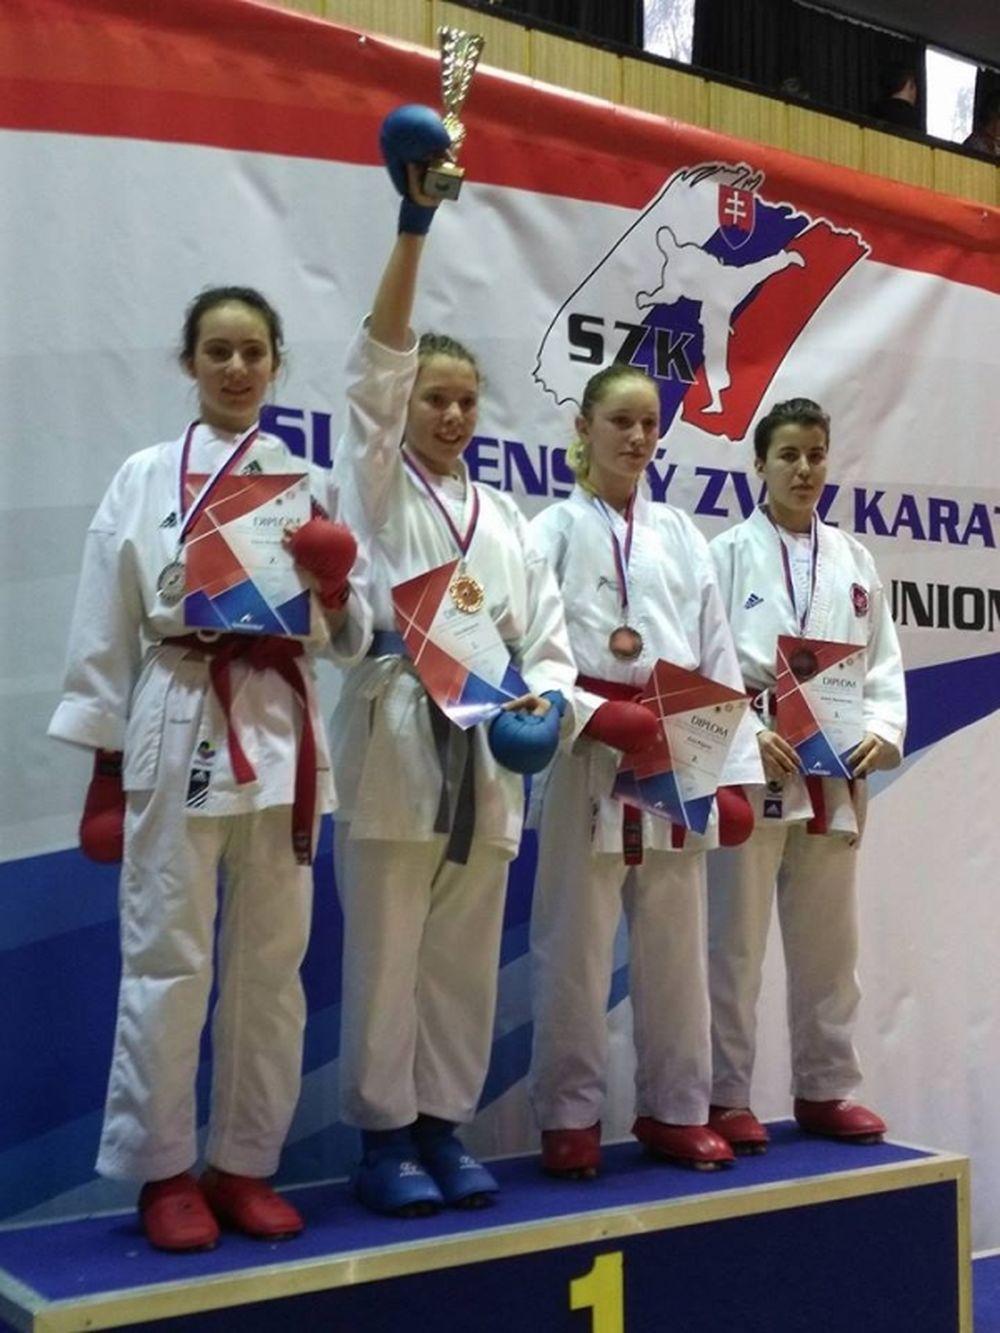 Úspechy Karate klub Žilina Trnava 3.12.2016 - 4.12.2016, foto 5